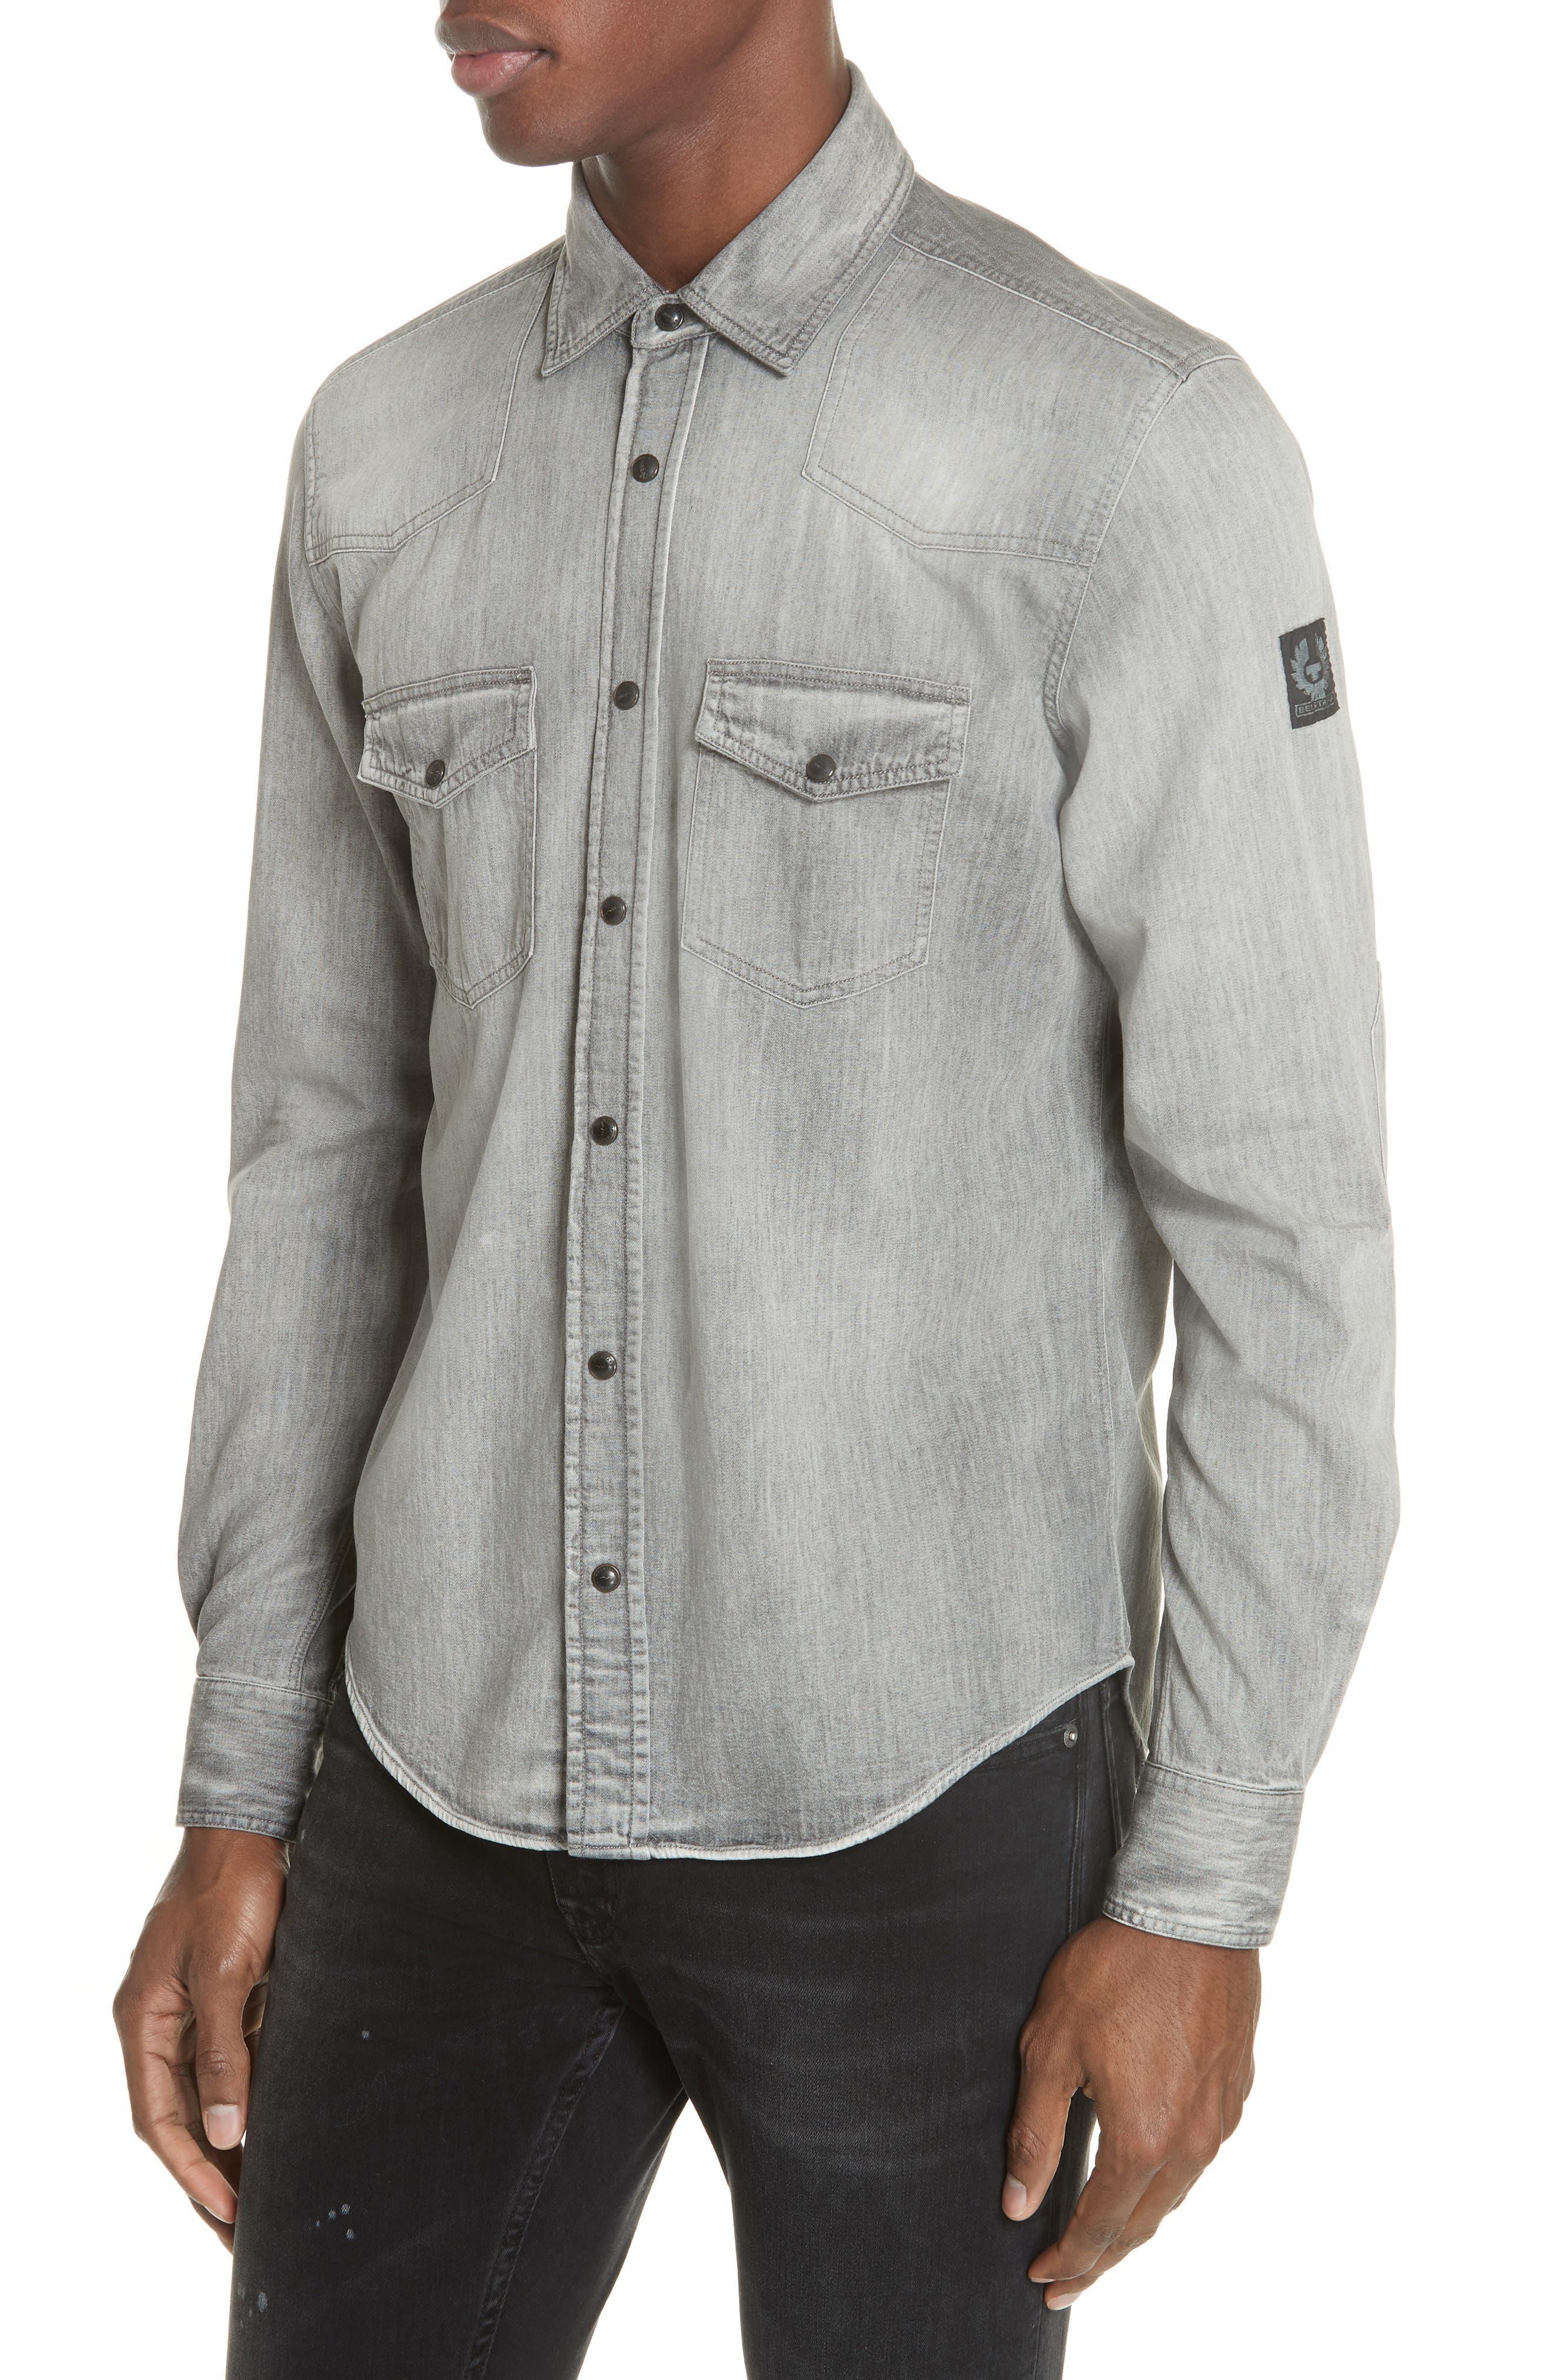 BELSTAFF Somerford Regular Fit Button-Down Shirt in Grey